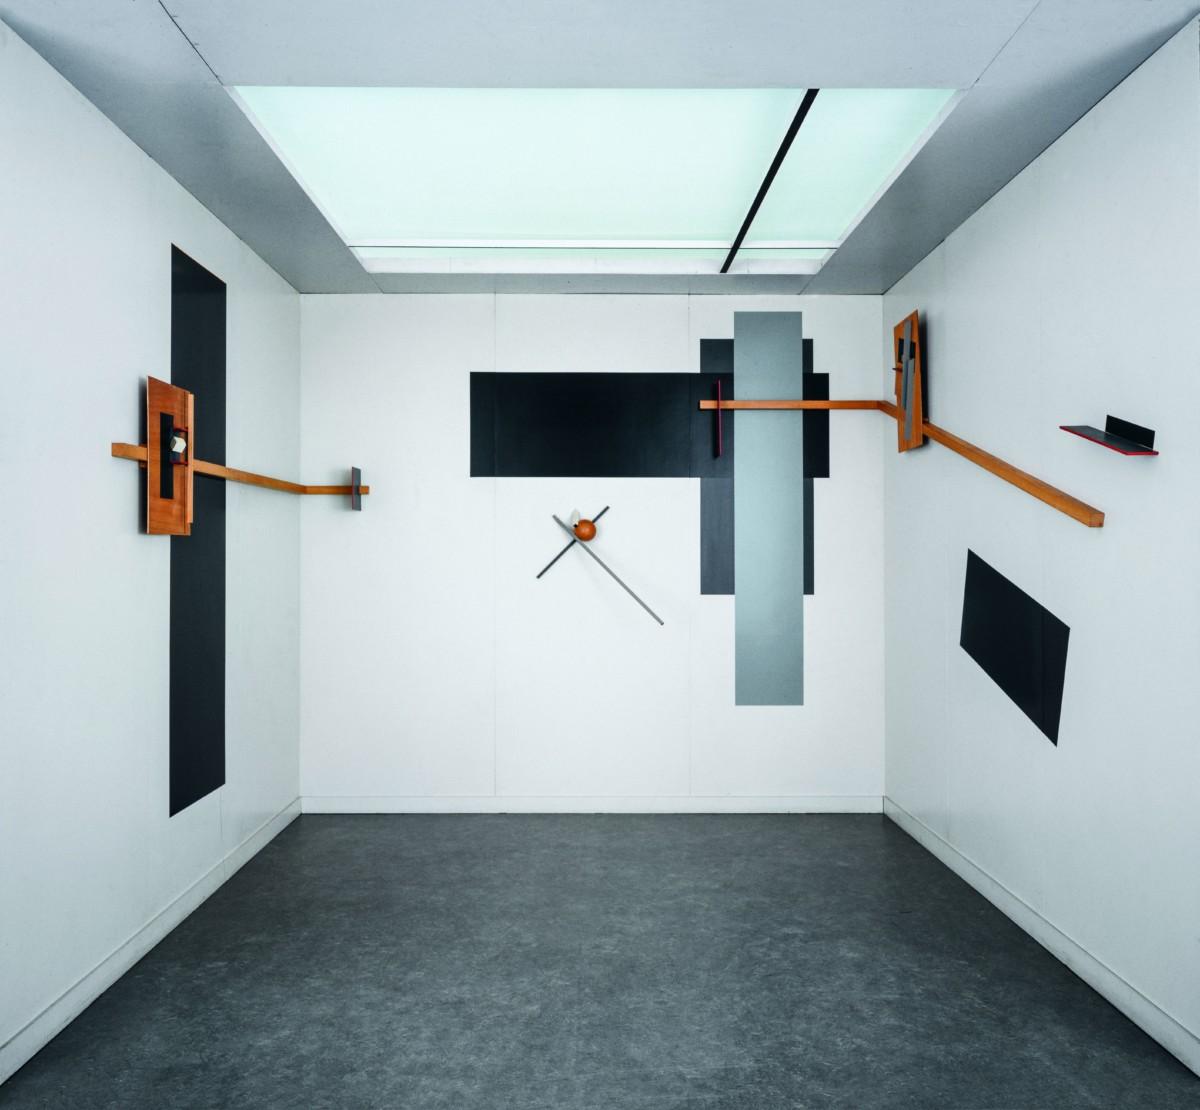 Design Luminy 25_el_lissitzky_prounenraum_1923_coll_van_abbemuseum_eindhoven_ph_peter_cox Proun Raum (1923) - El Lissitzky (1890-1941) Histoire du design Références  Proun Raum Proun El Lissitsky Constructivisme